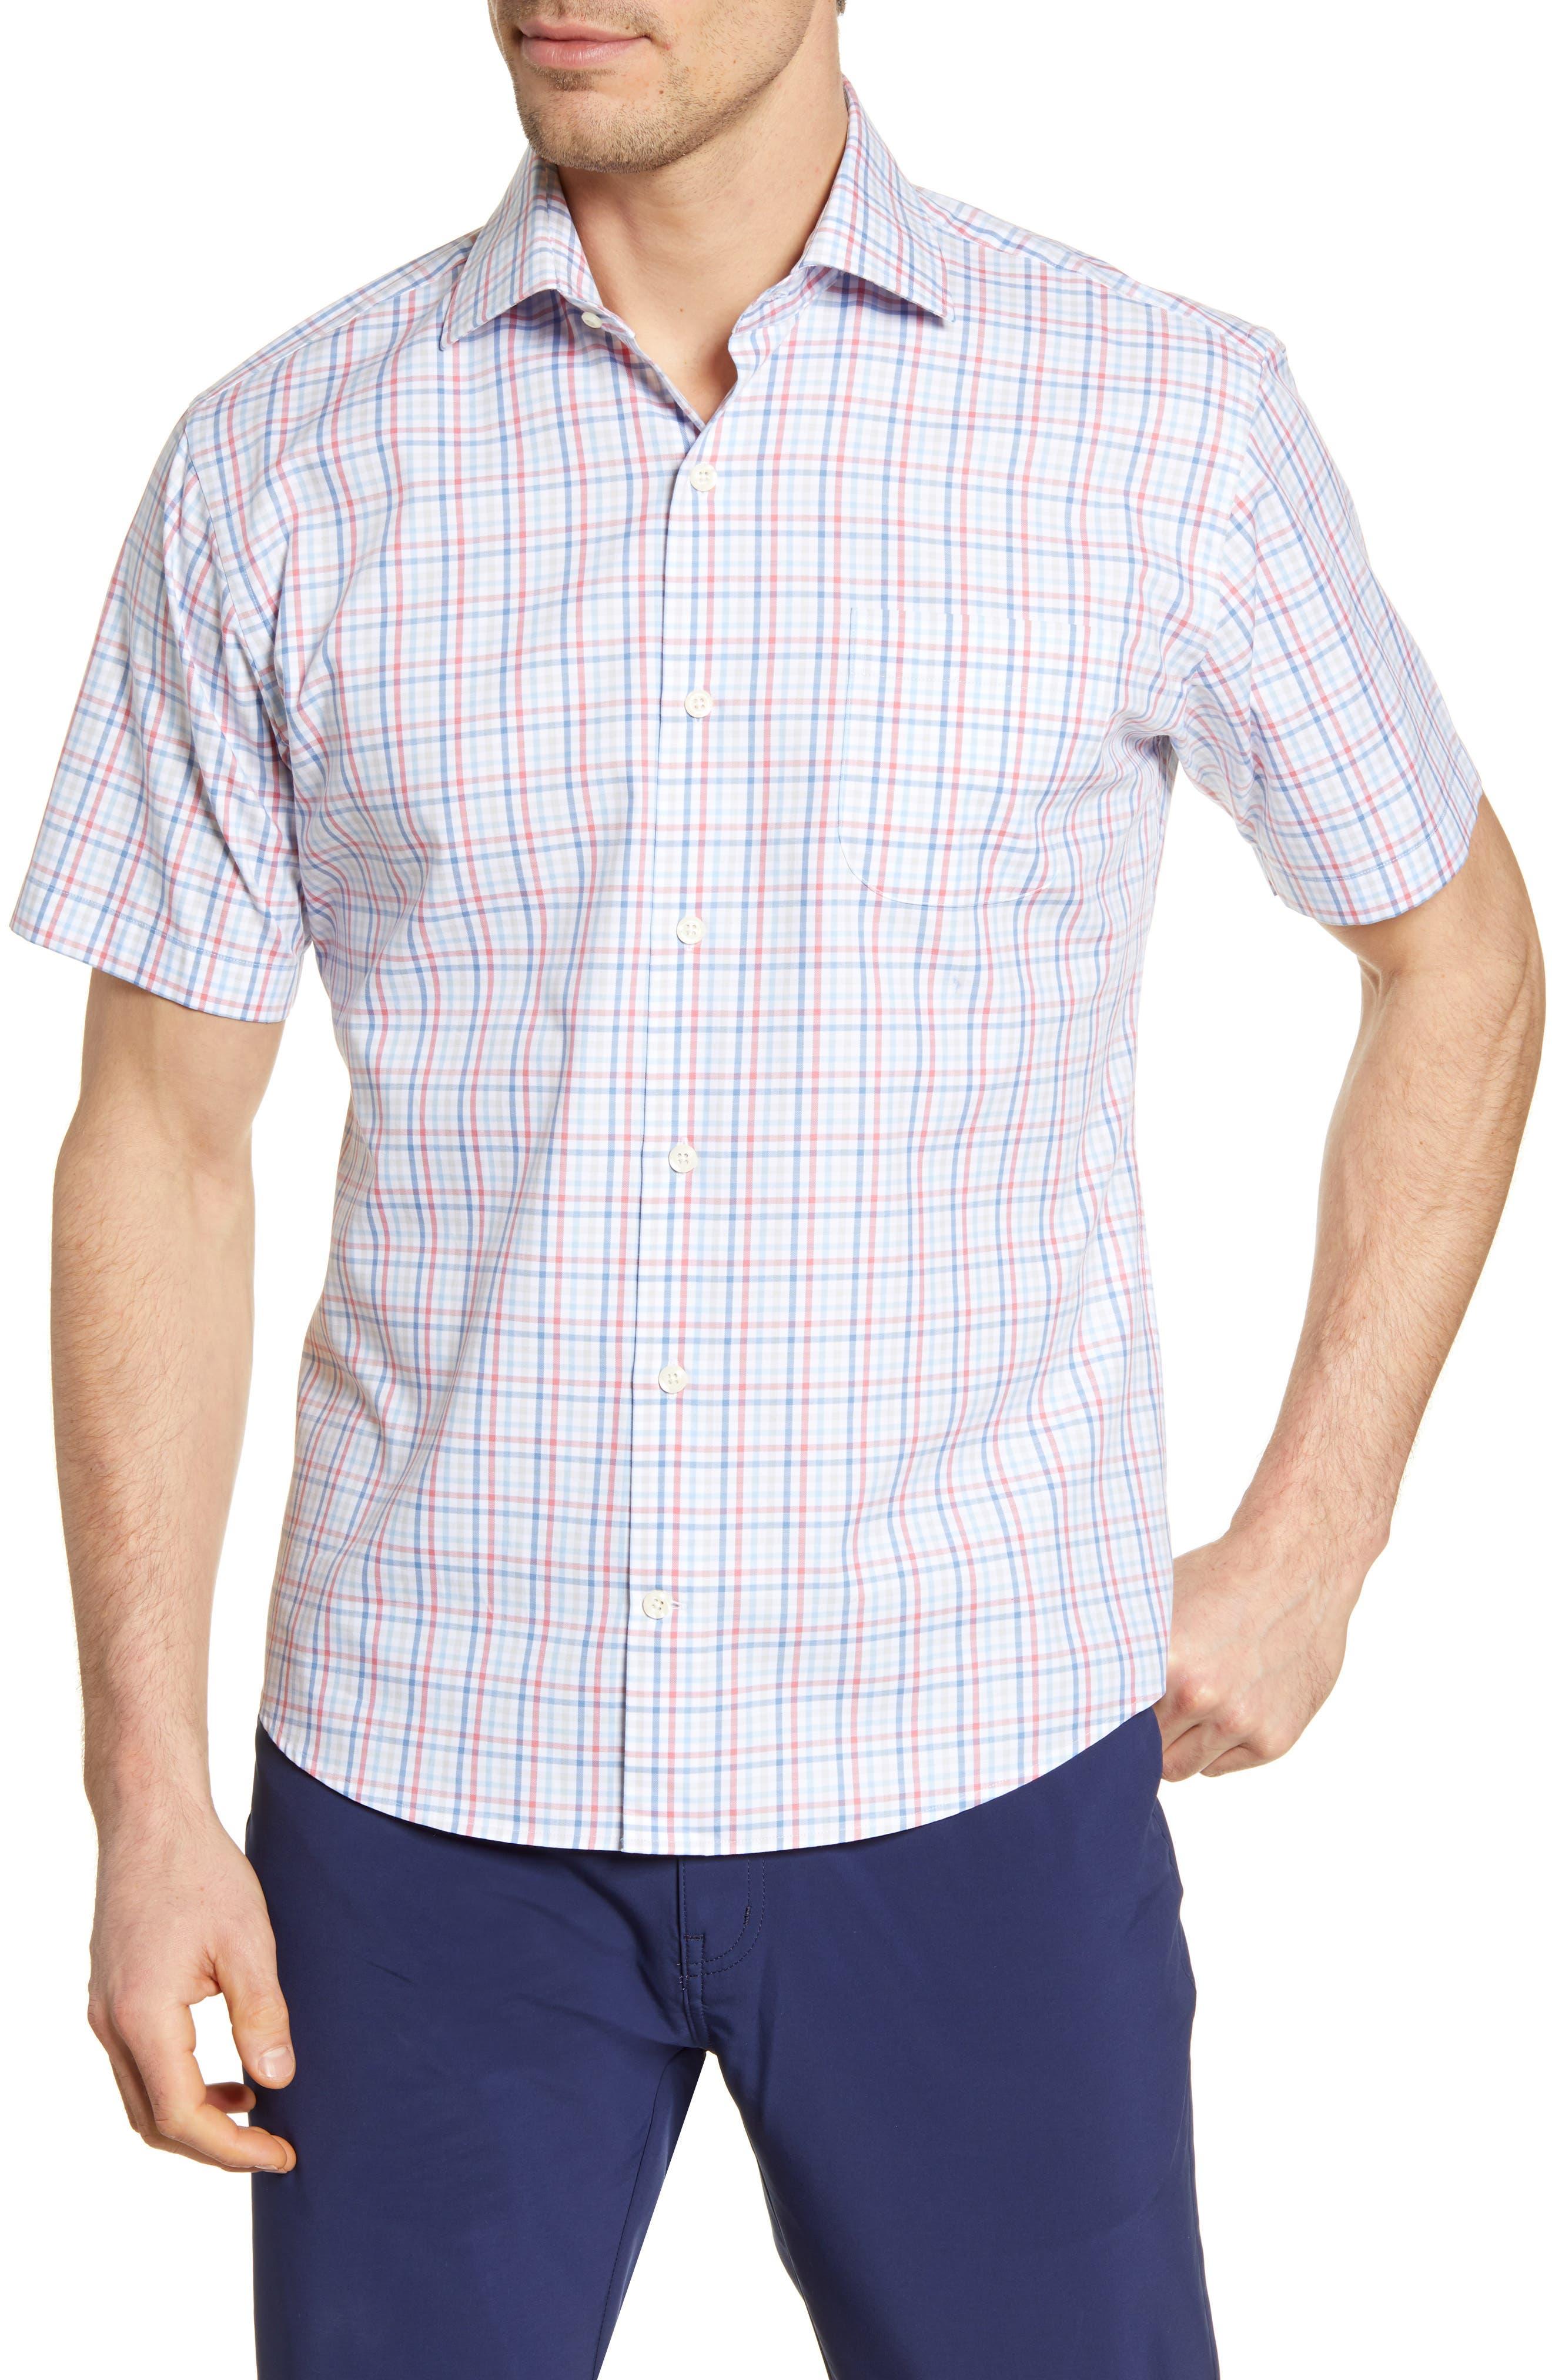 Image of Peter Millar Table Rock Regular Fit Check Short Sleeve Button-Up Shirt